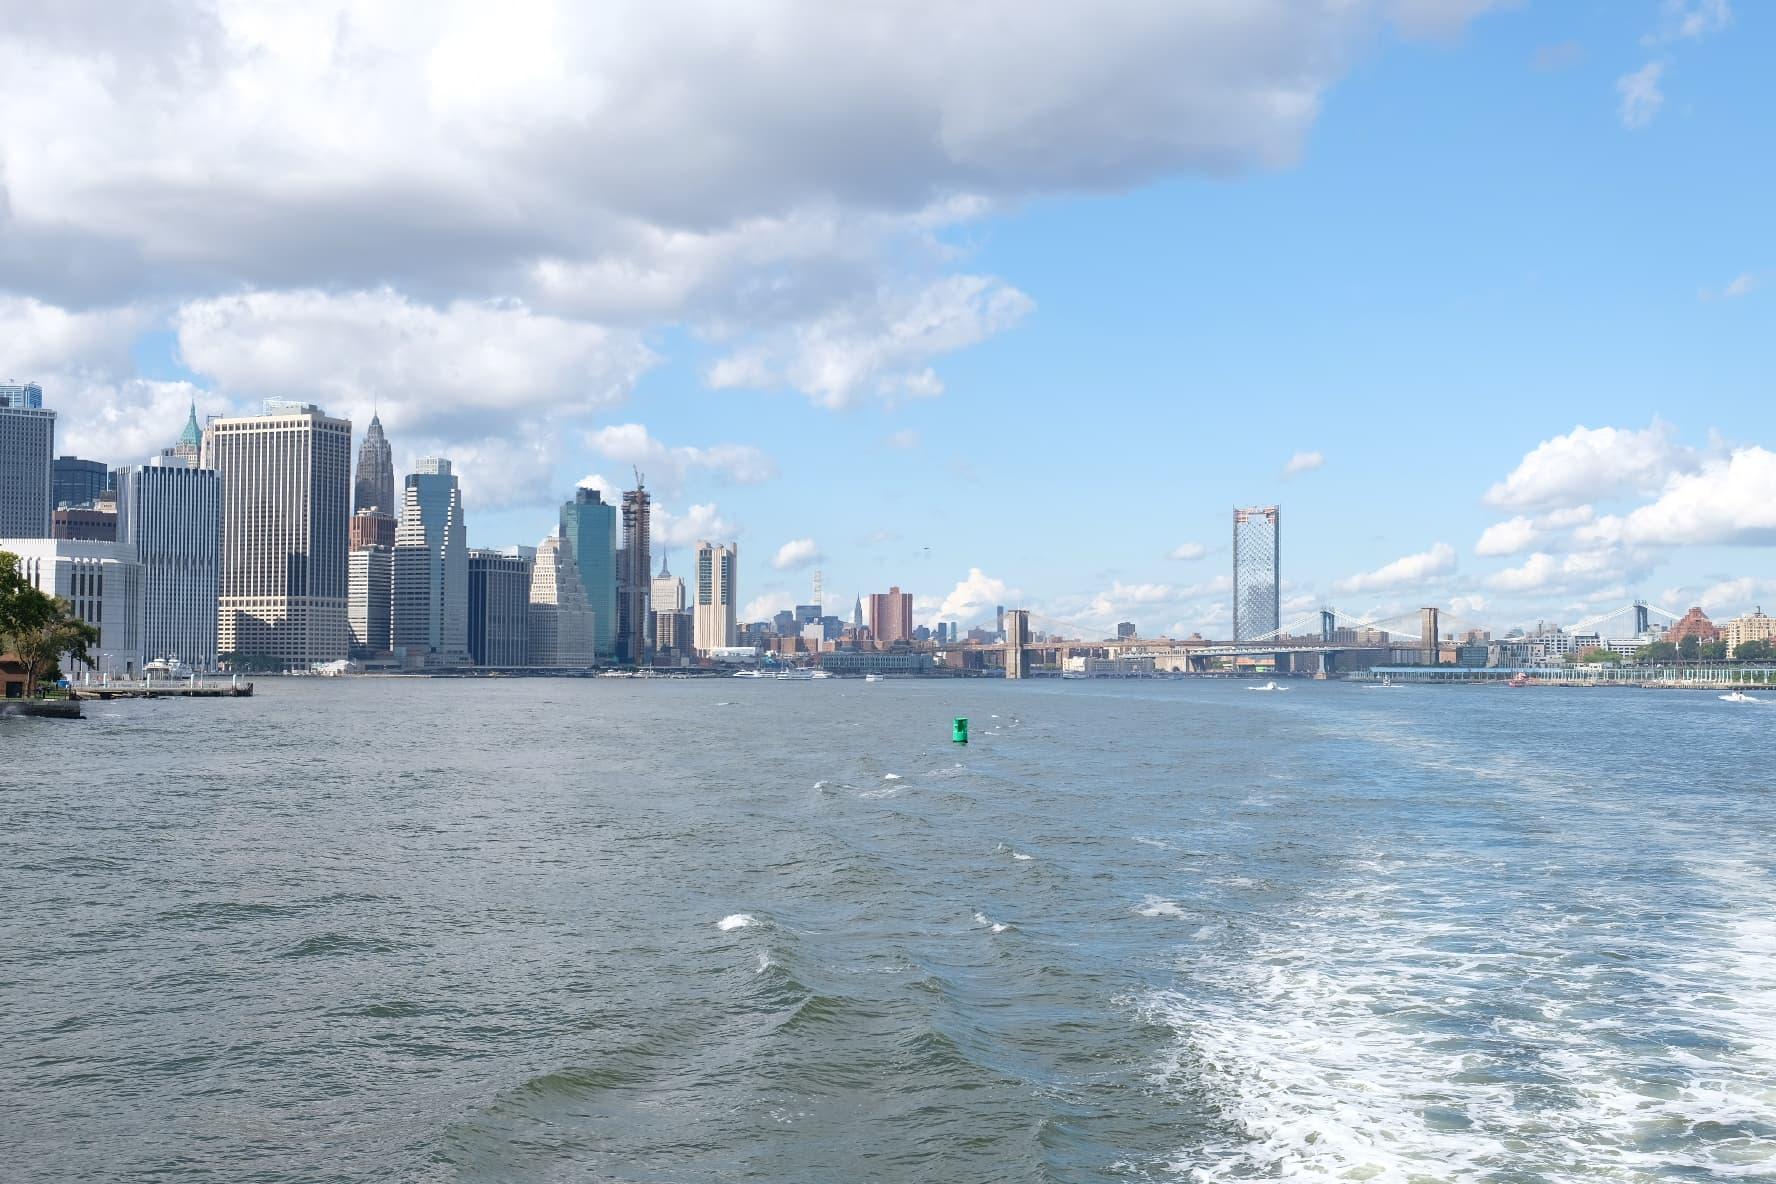 ferry NYC island water New York city